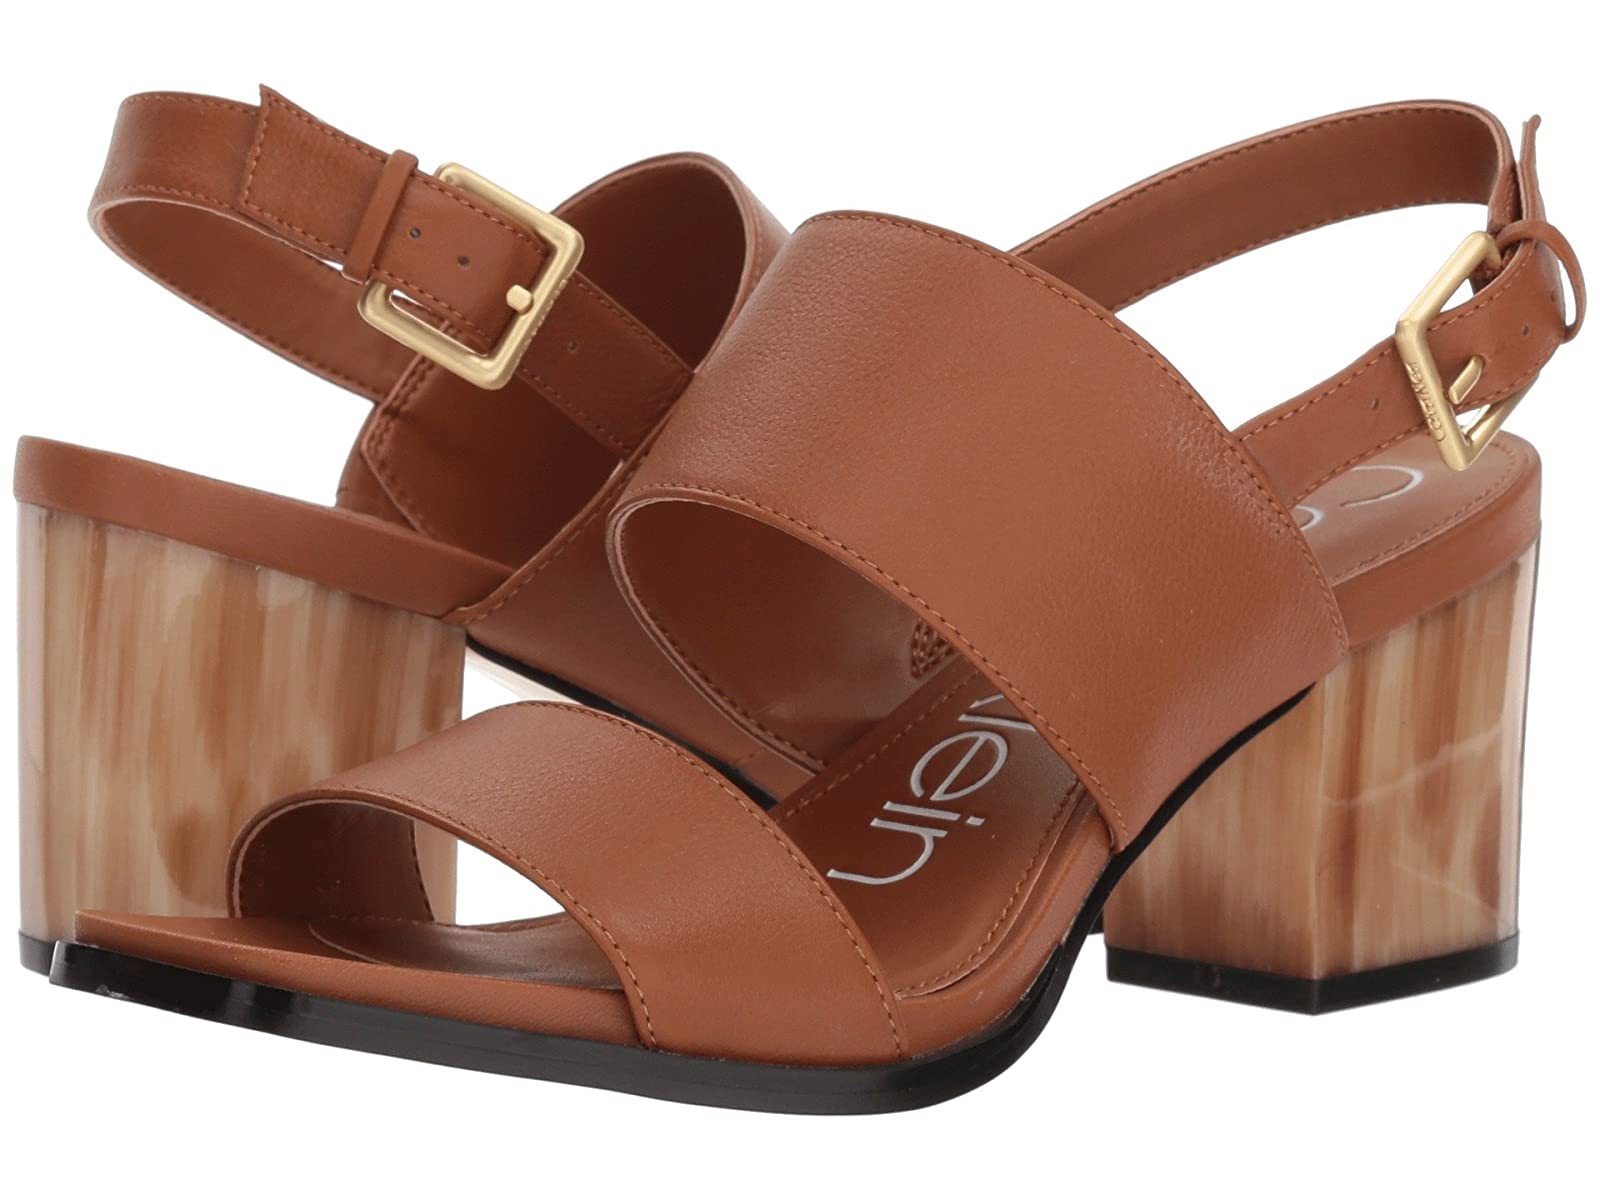 Calvin Klein Rosemary Block Heel SandalCheap and distinctive eye-catching shoes